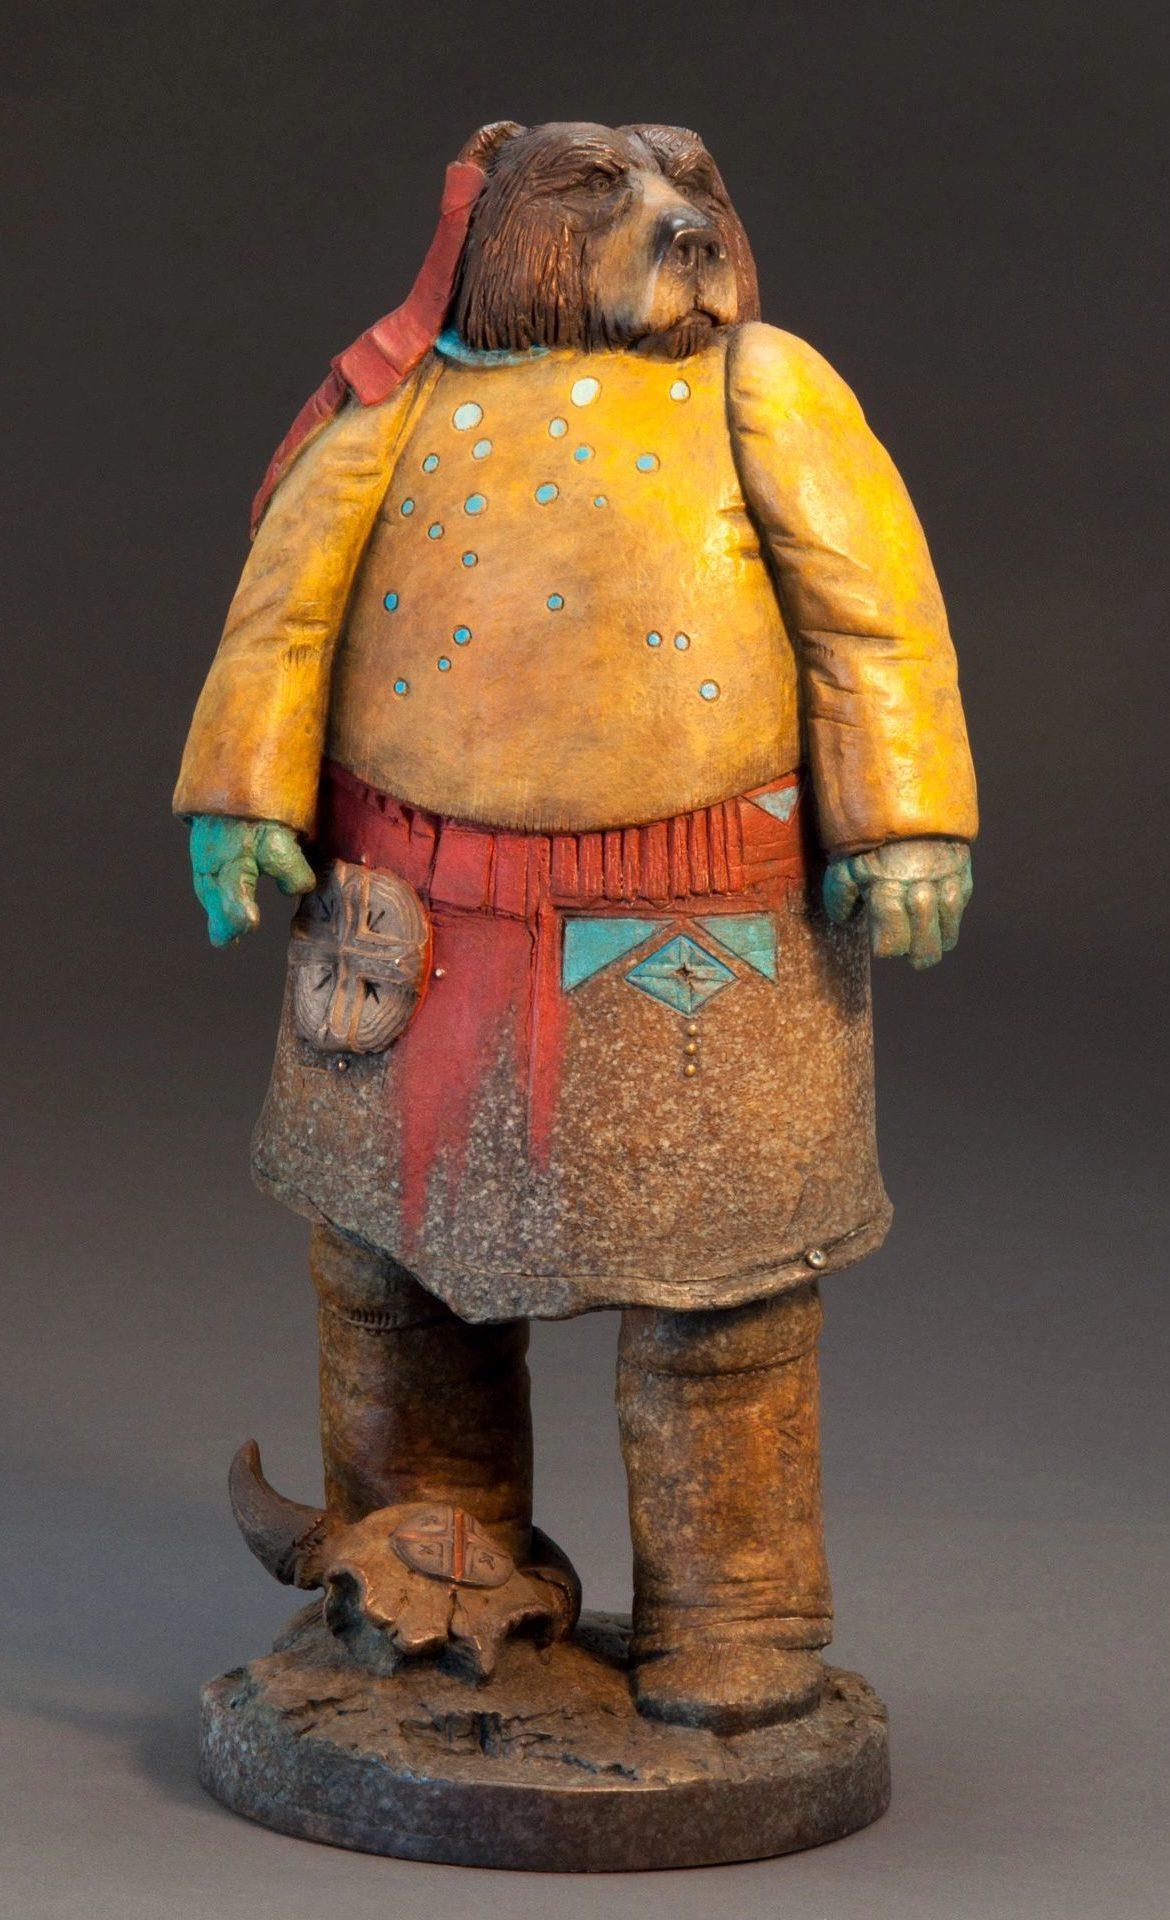 Trust in Reason, Brubaker, Bronze Sculpture, Rogoway Gallery